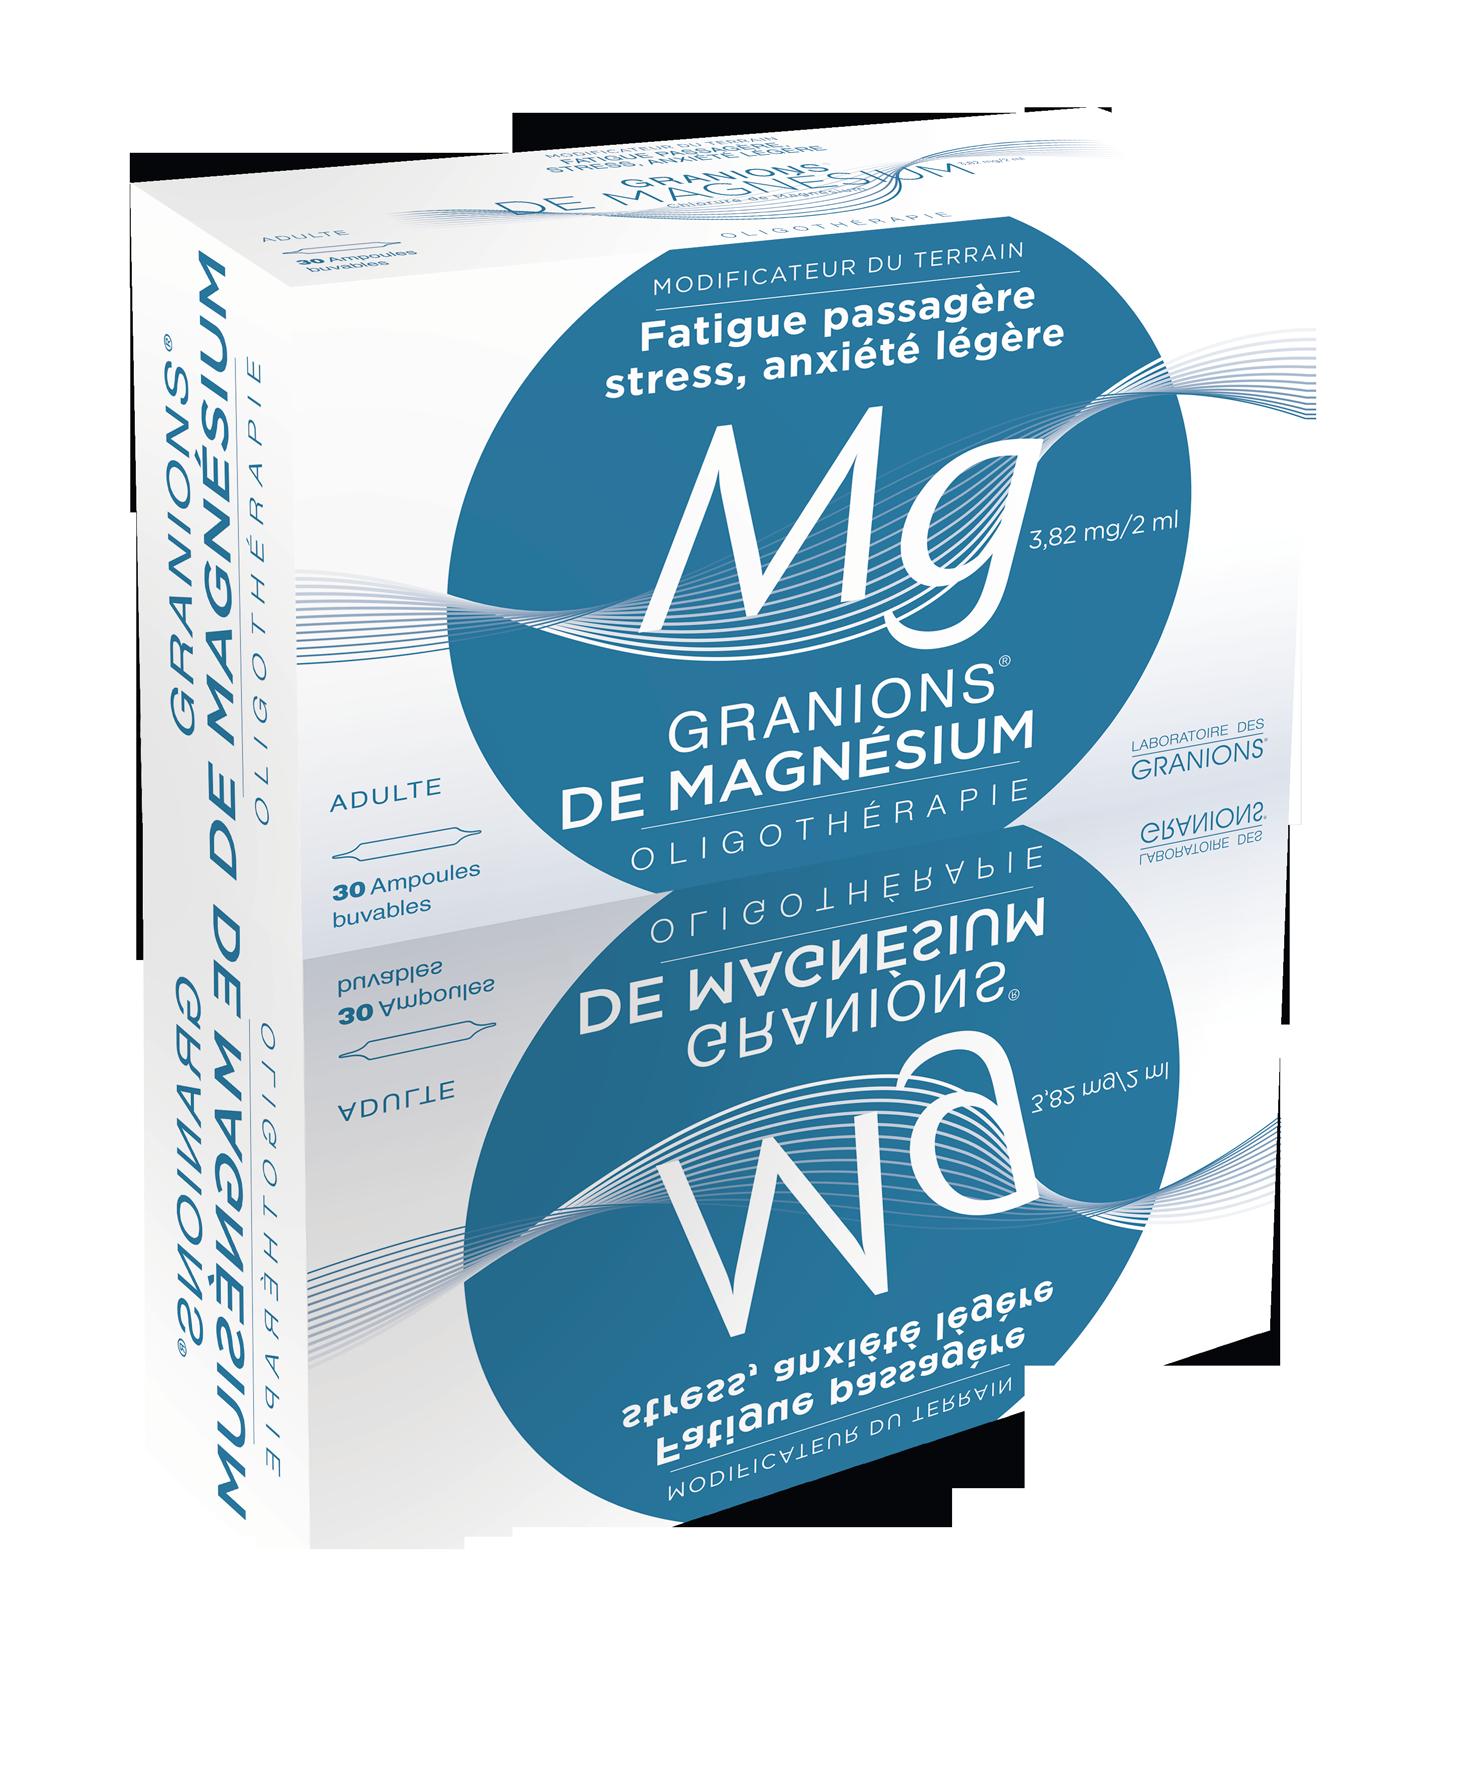 Image GRANIONS DE MAGNESIUM 3,82 mg/2 ml S buv 30Amp/2ml